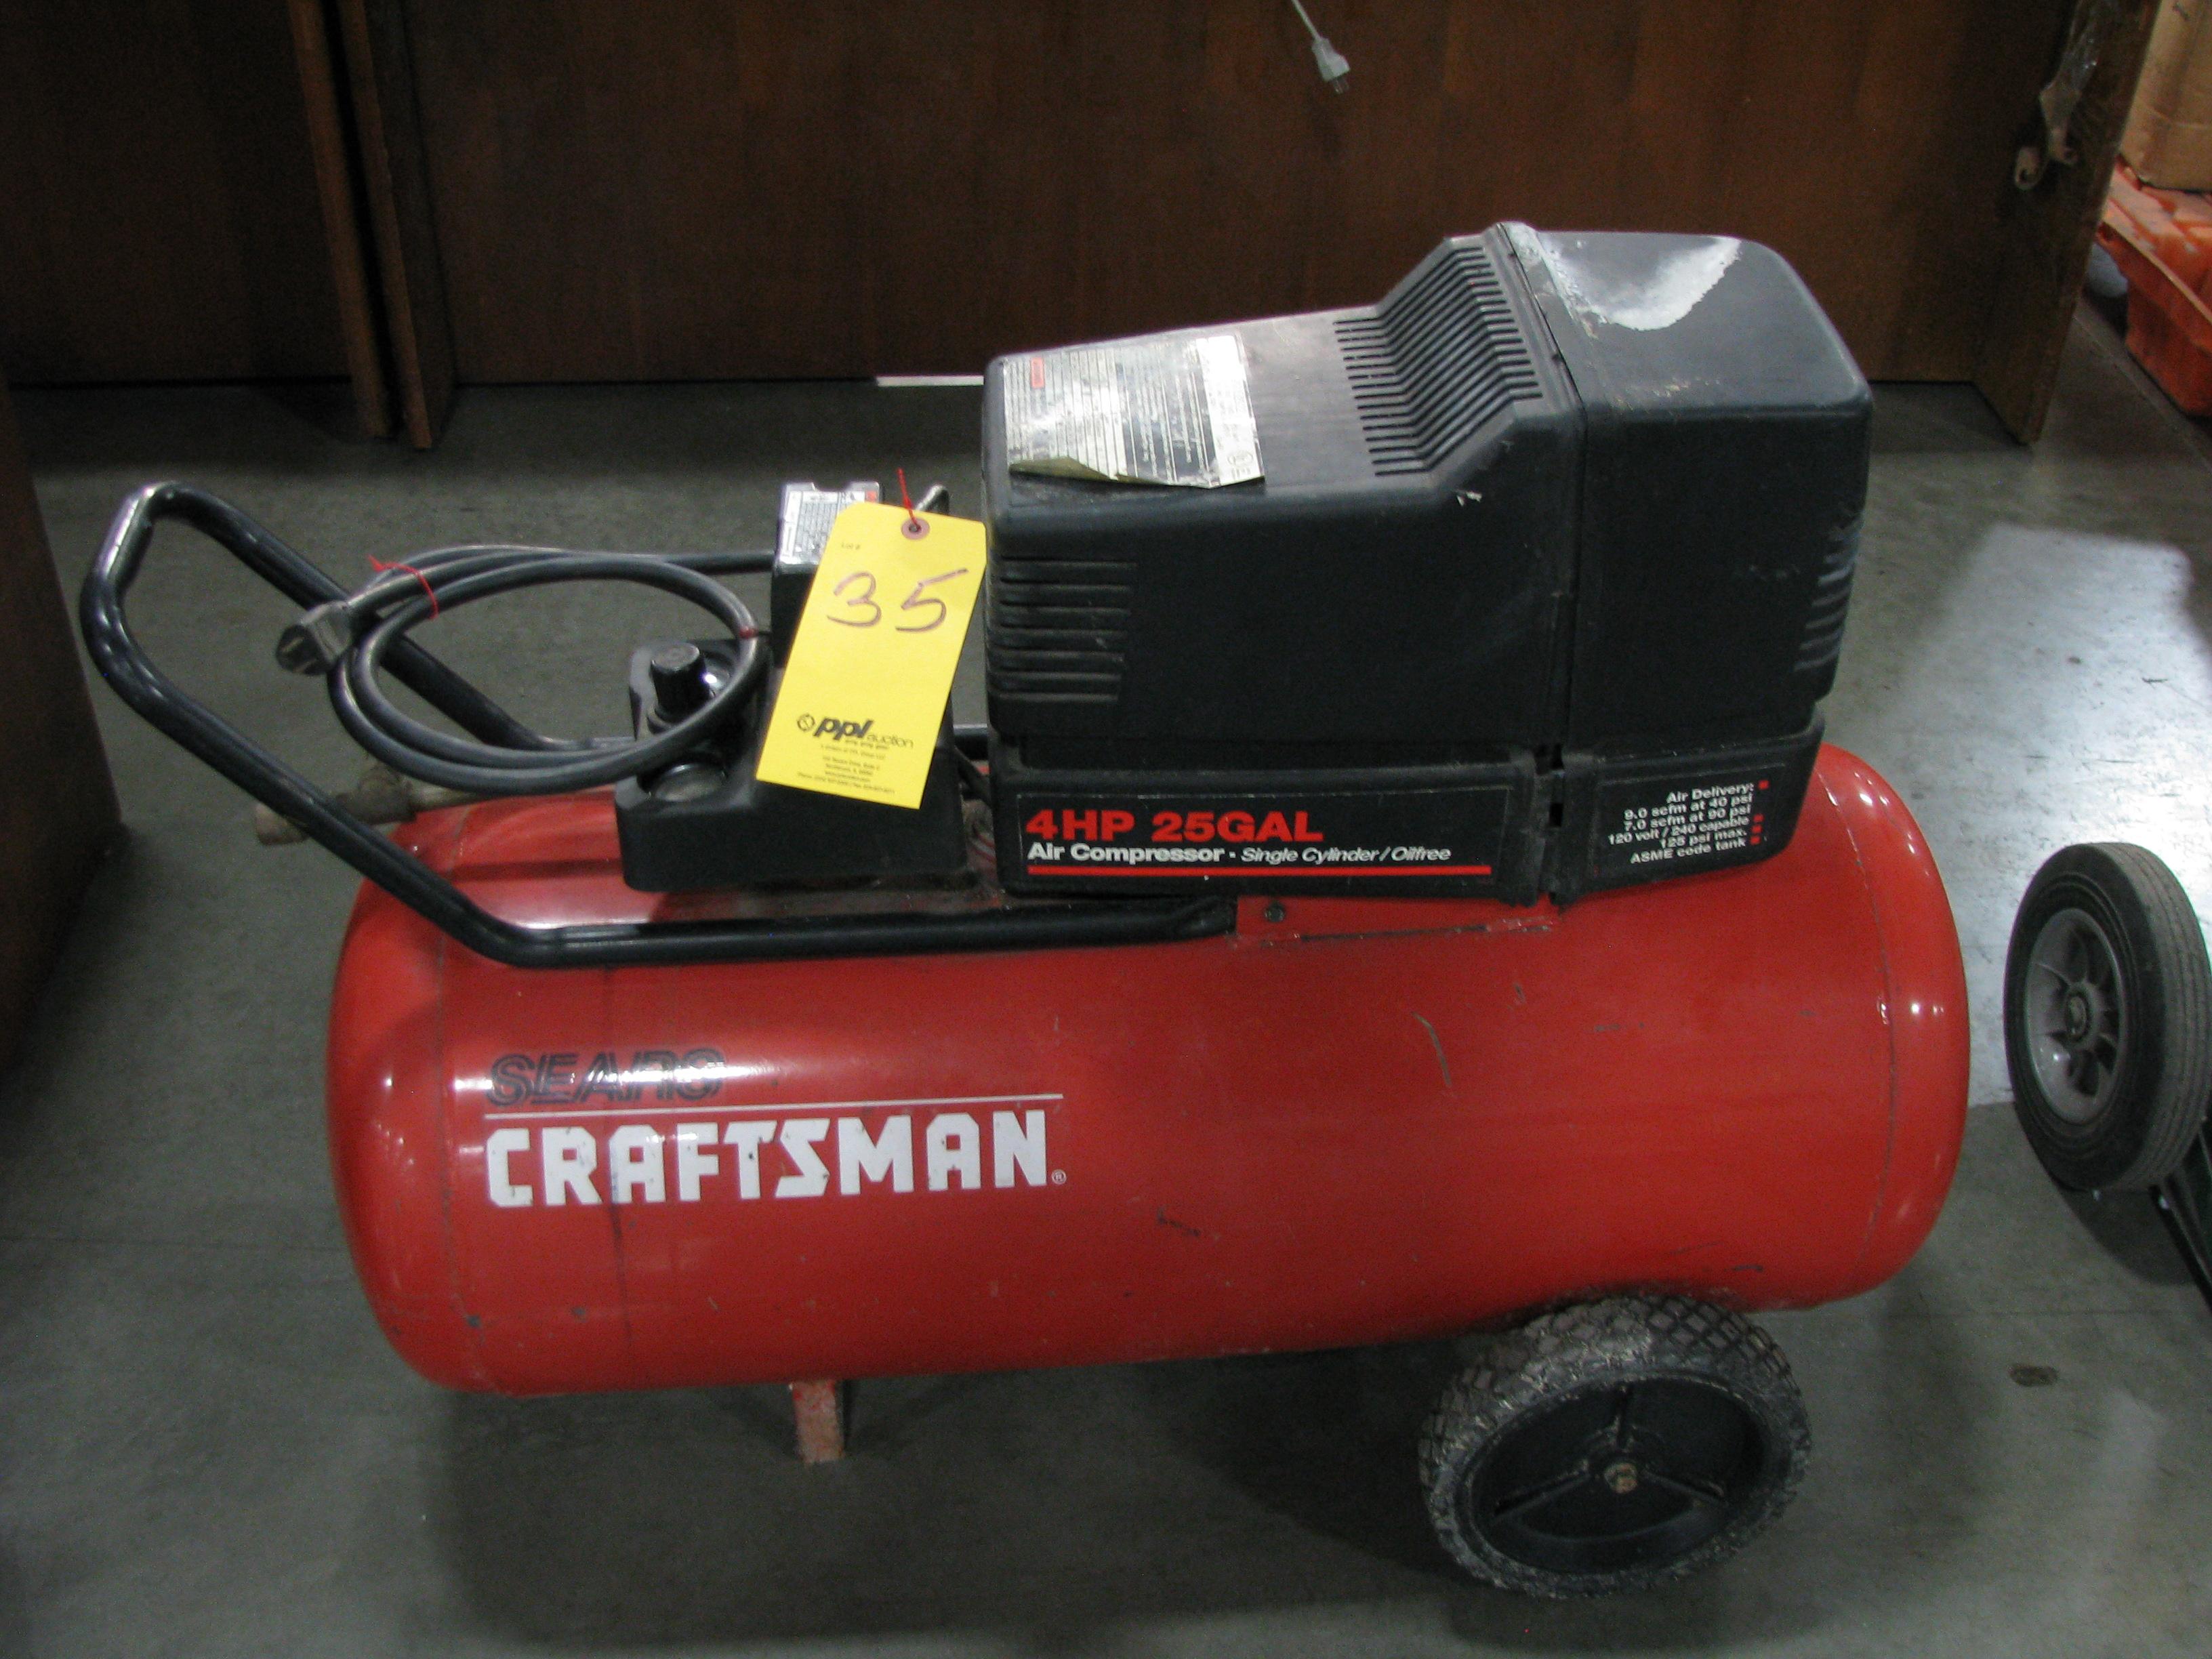 Craftsman 4 Hp 25 Gallon Portable Air Compressor